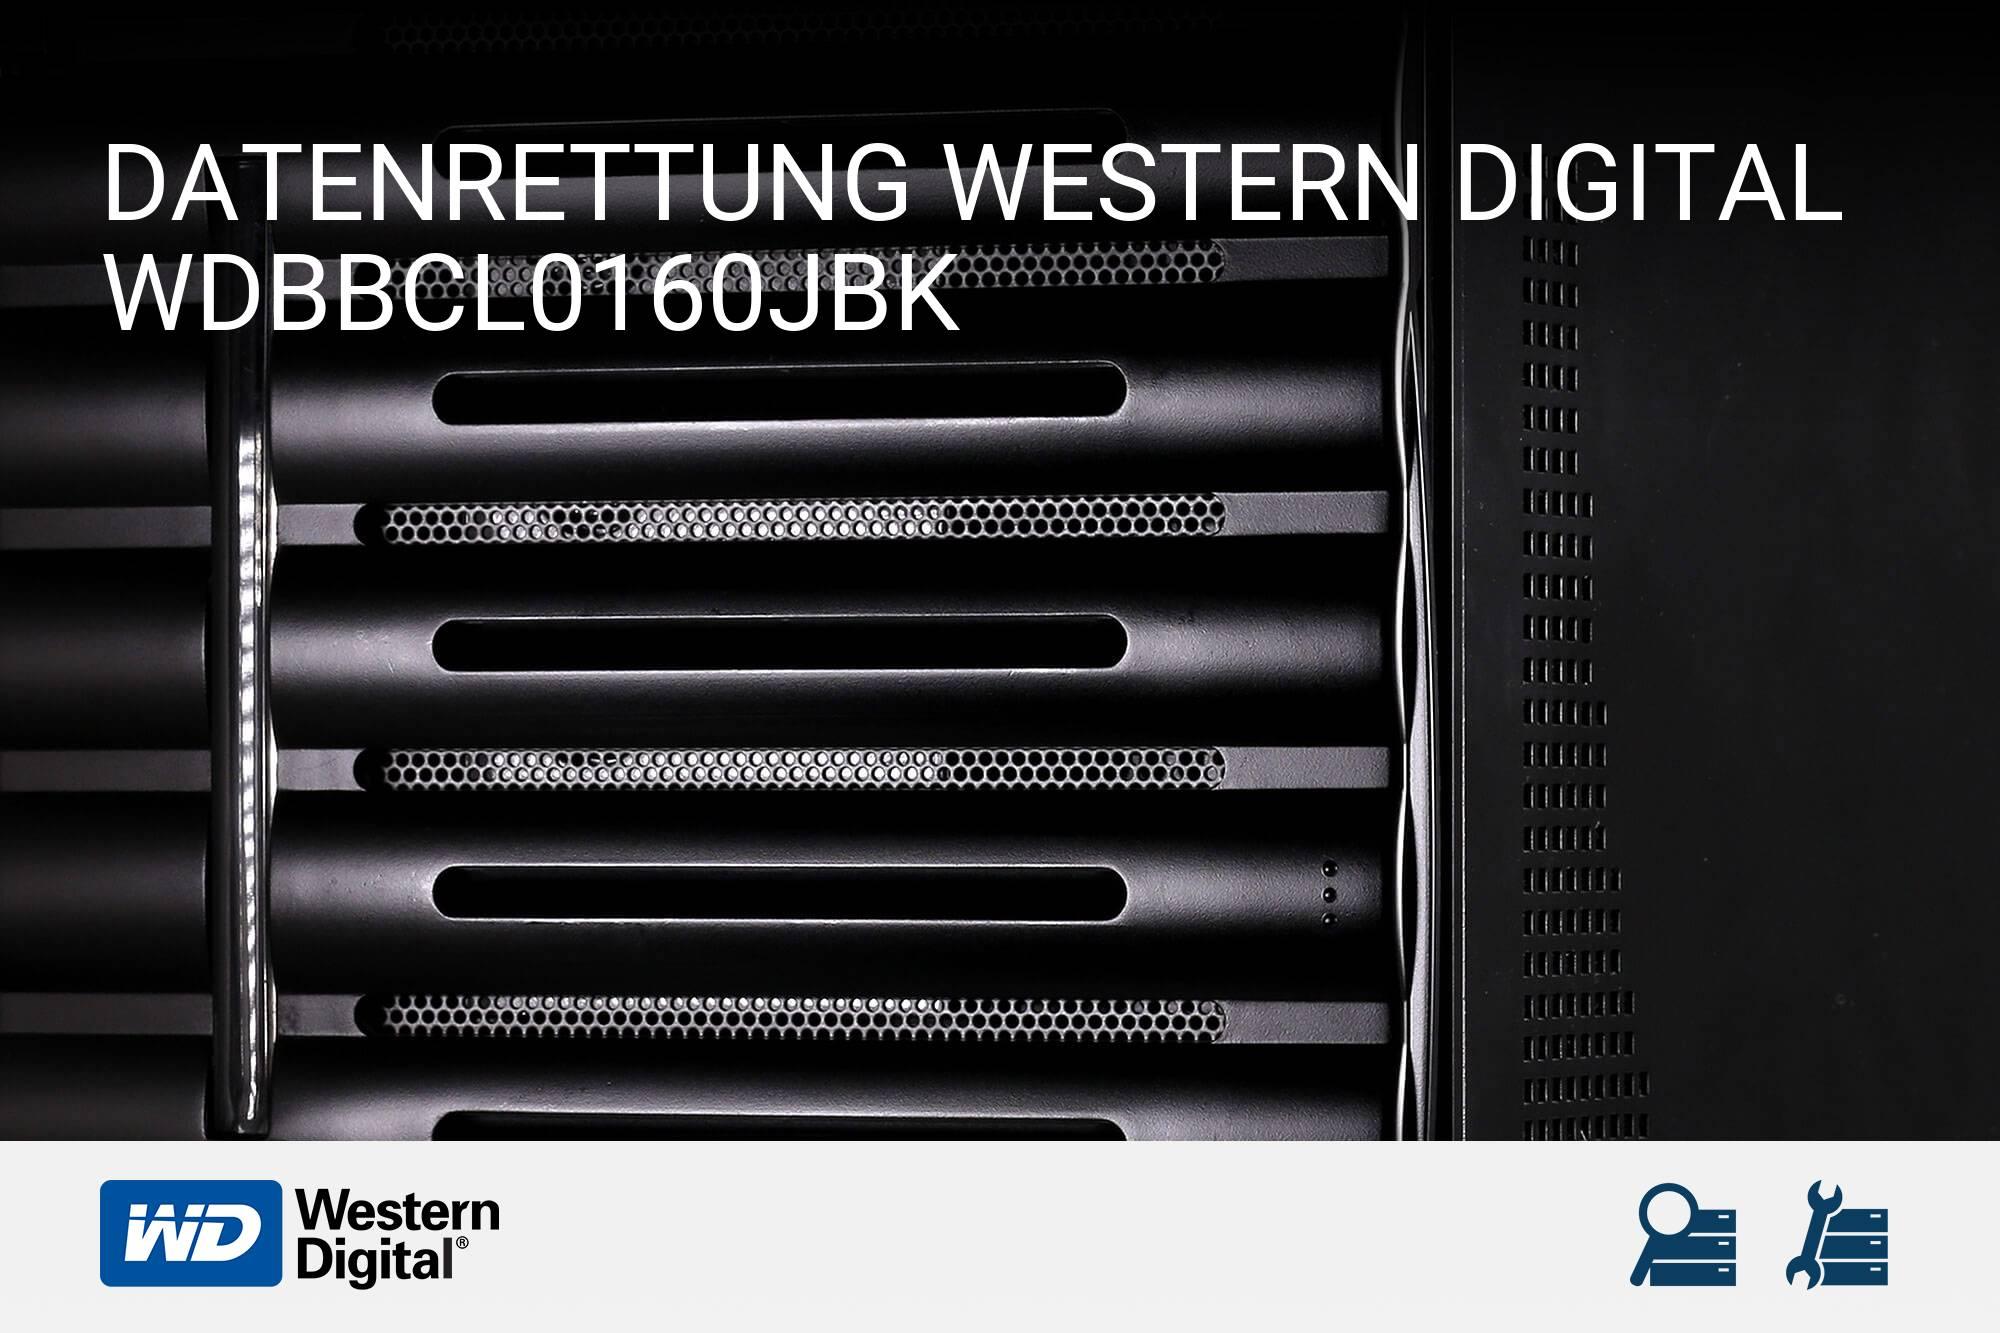 Western Digital WDBBCL0160JBK